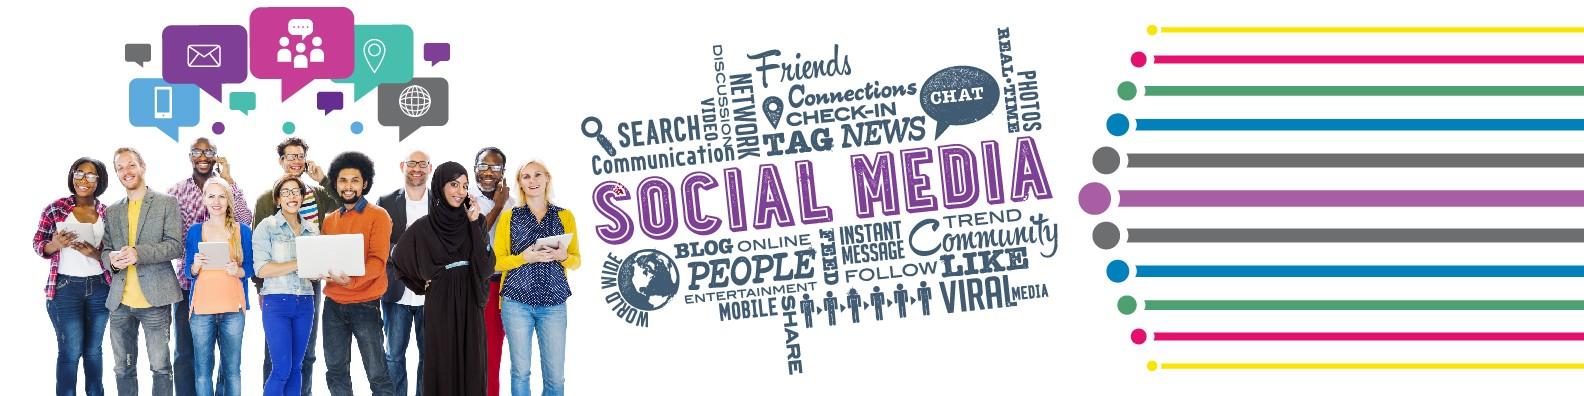 Generation C - Digital Marketing Agency   LinkedIn